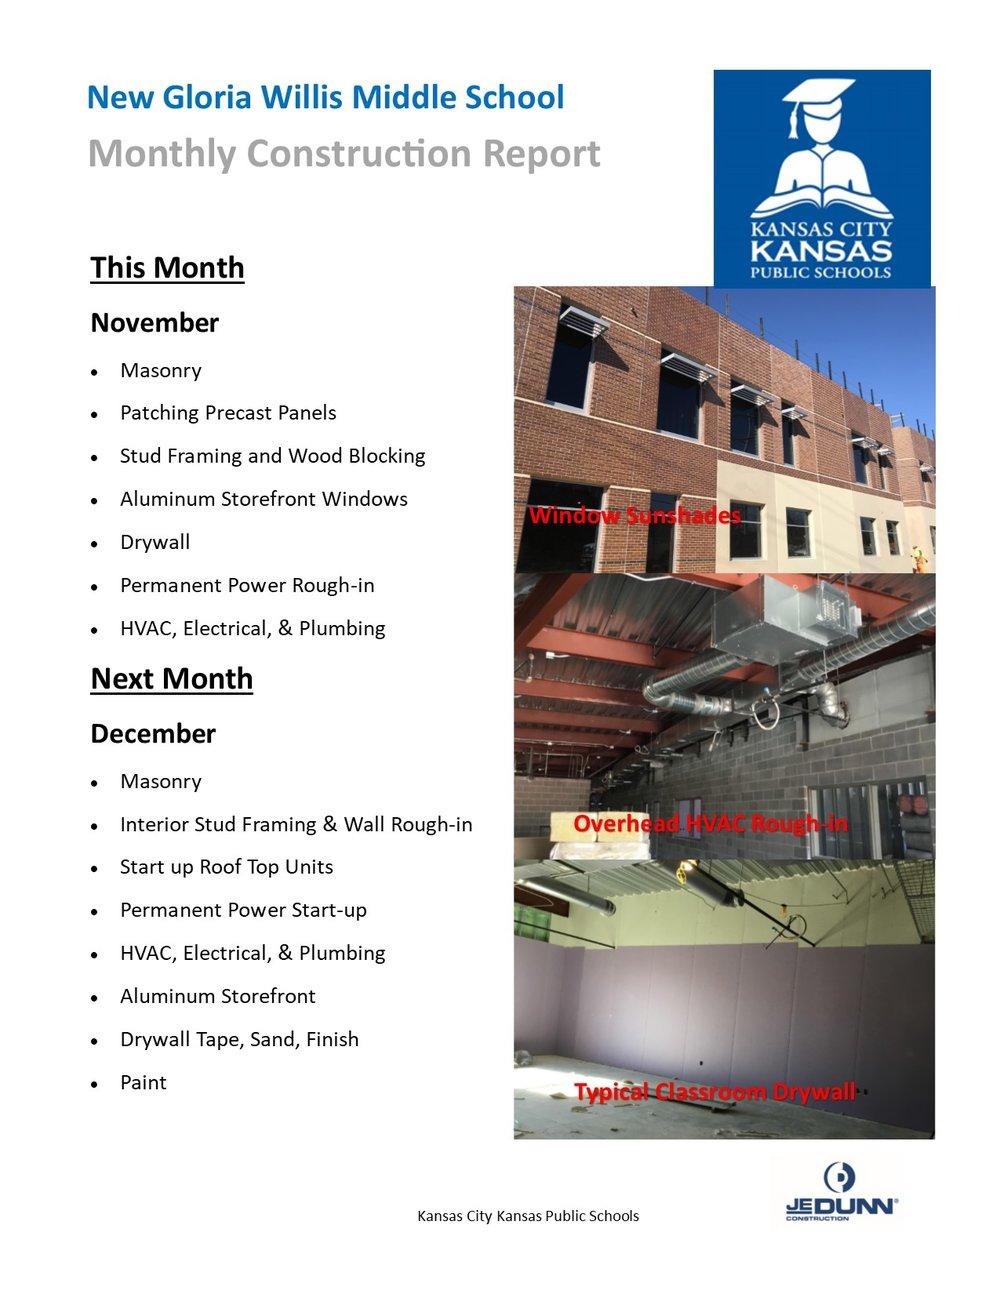 2018.11.15 - GWMS November Photo Report.jpg